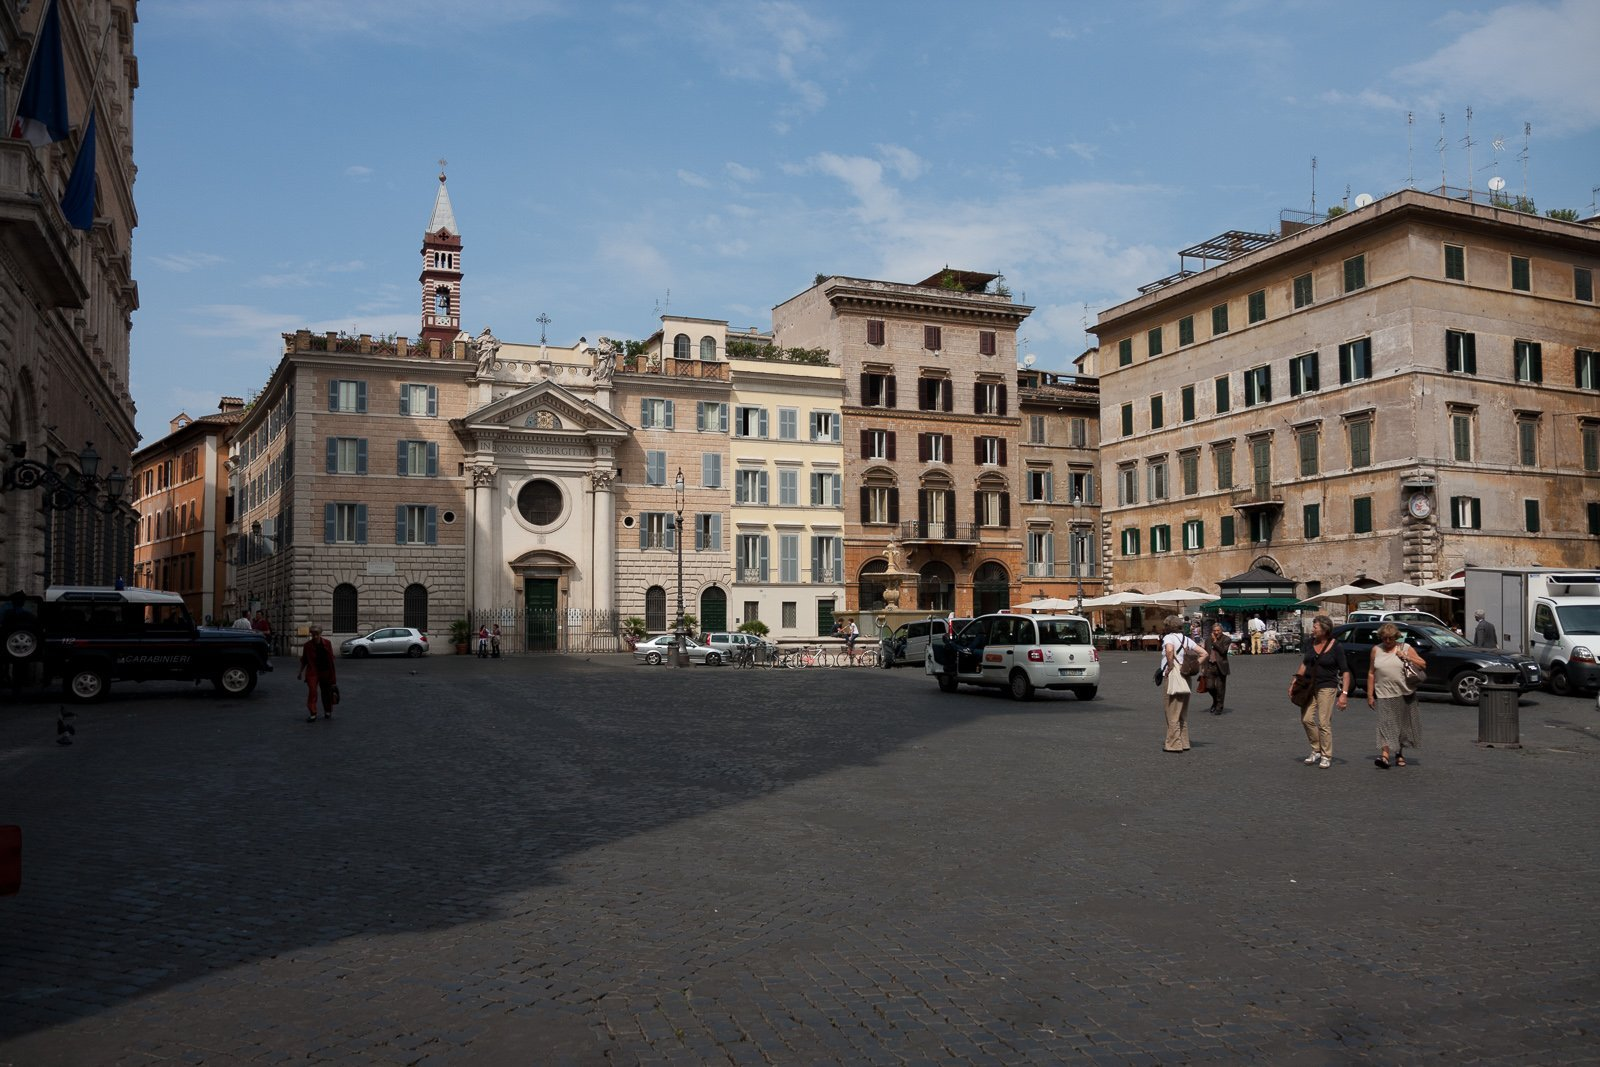 Via Giulia and the Rione Regola